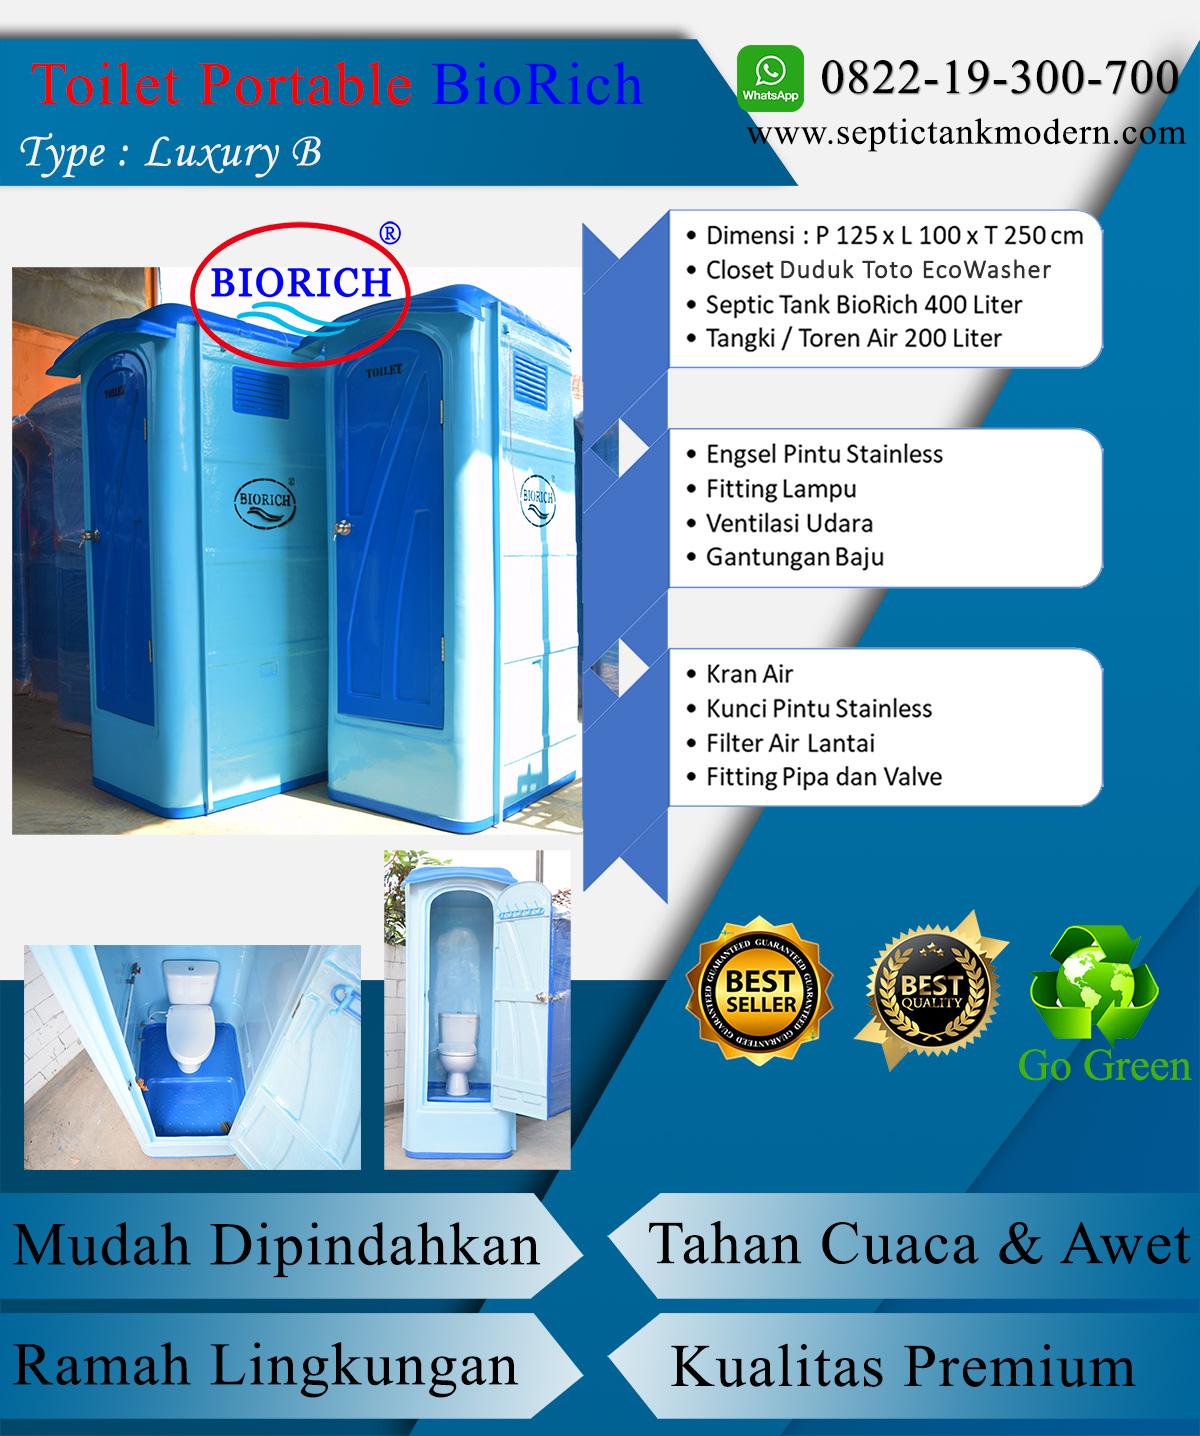 toilet portable tipe b standart wc portable produsen murah pabrik agen proyek jual murah terbaik fiber frp lux b Toilet Portable BioRich Tipe Luxury B